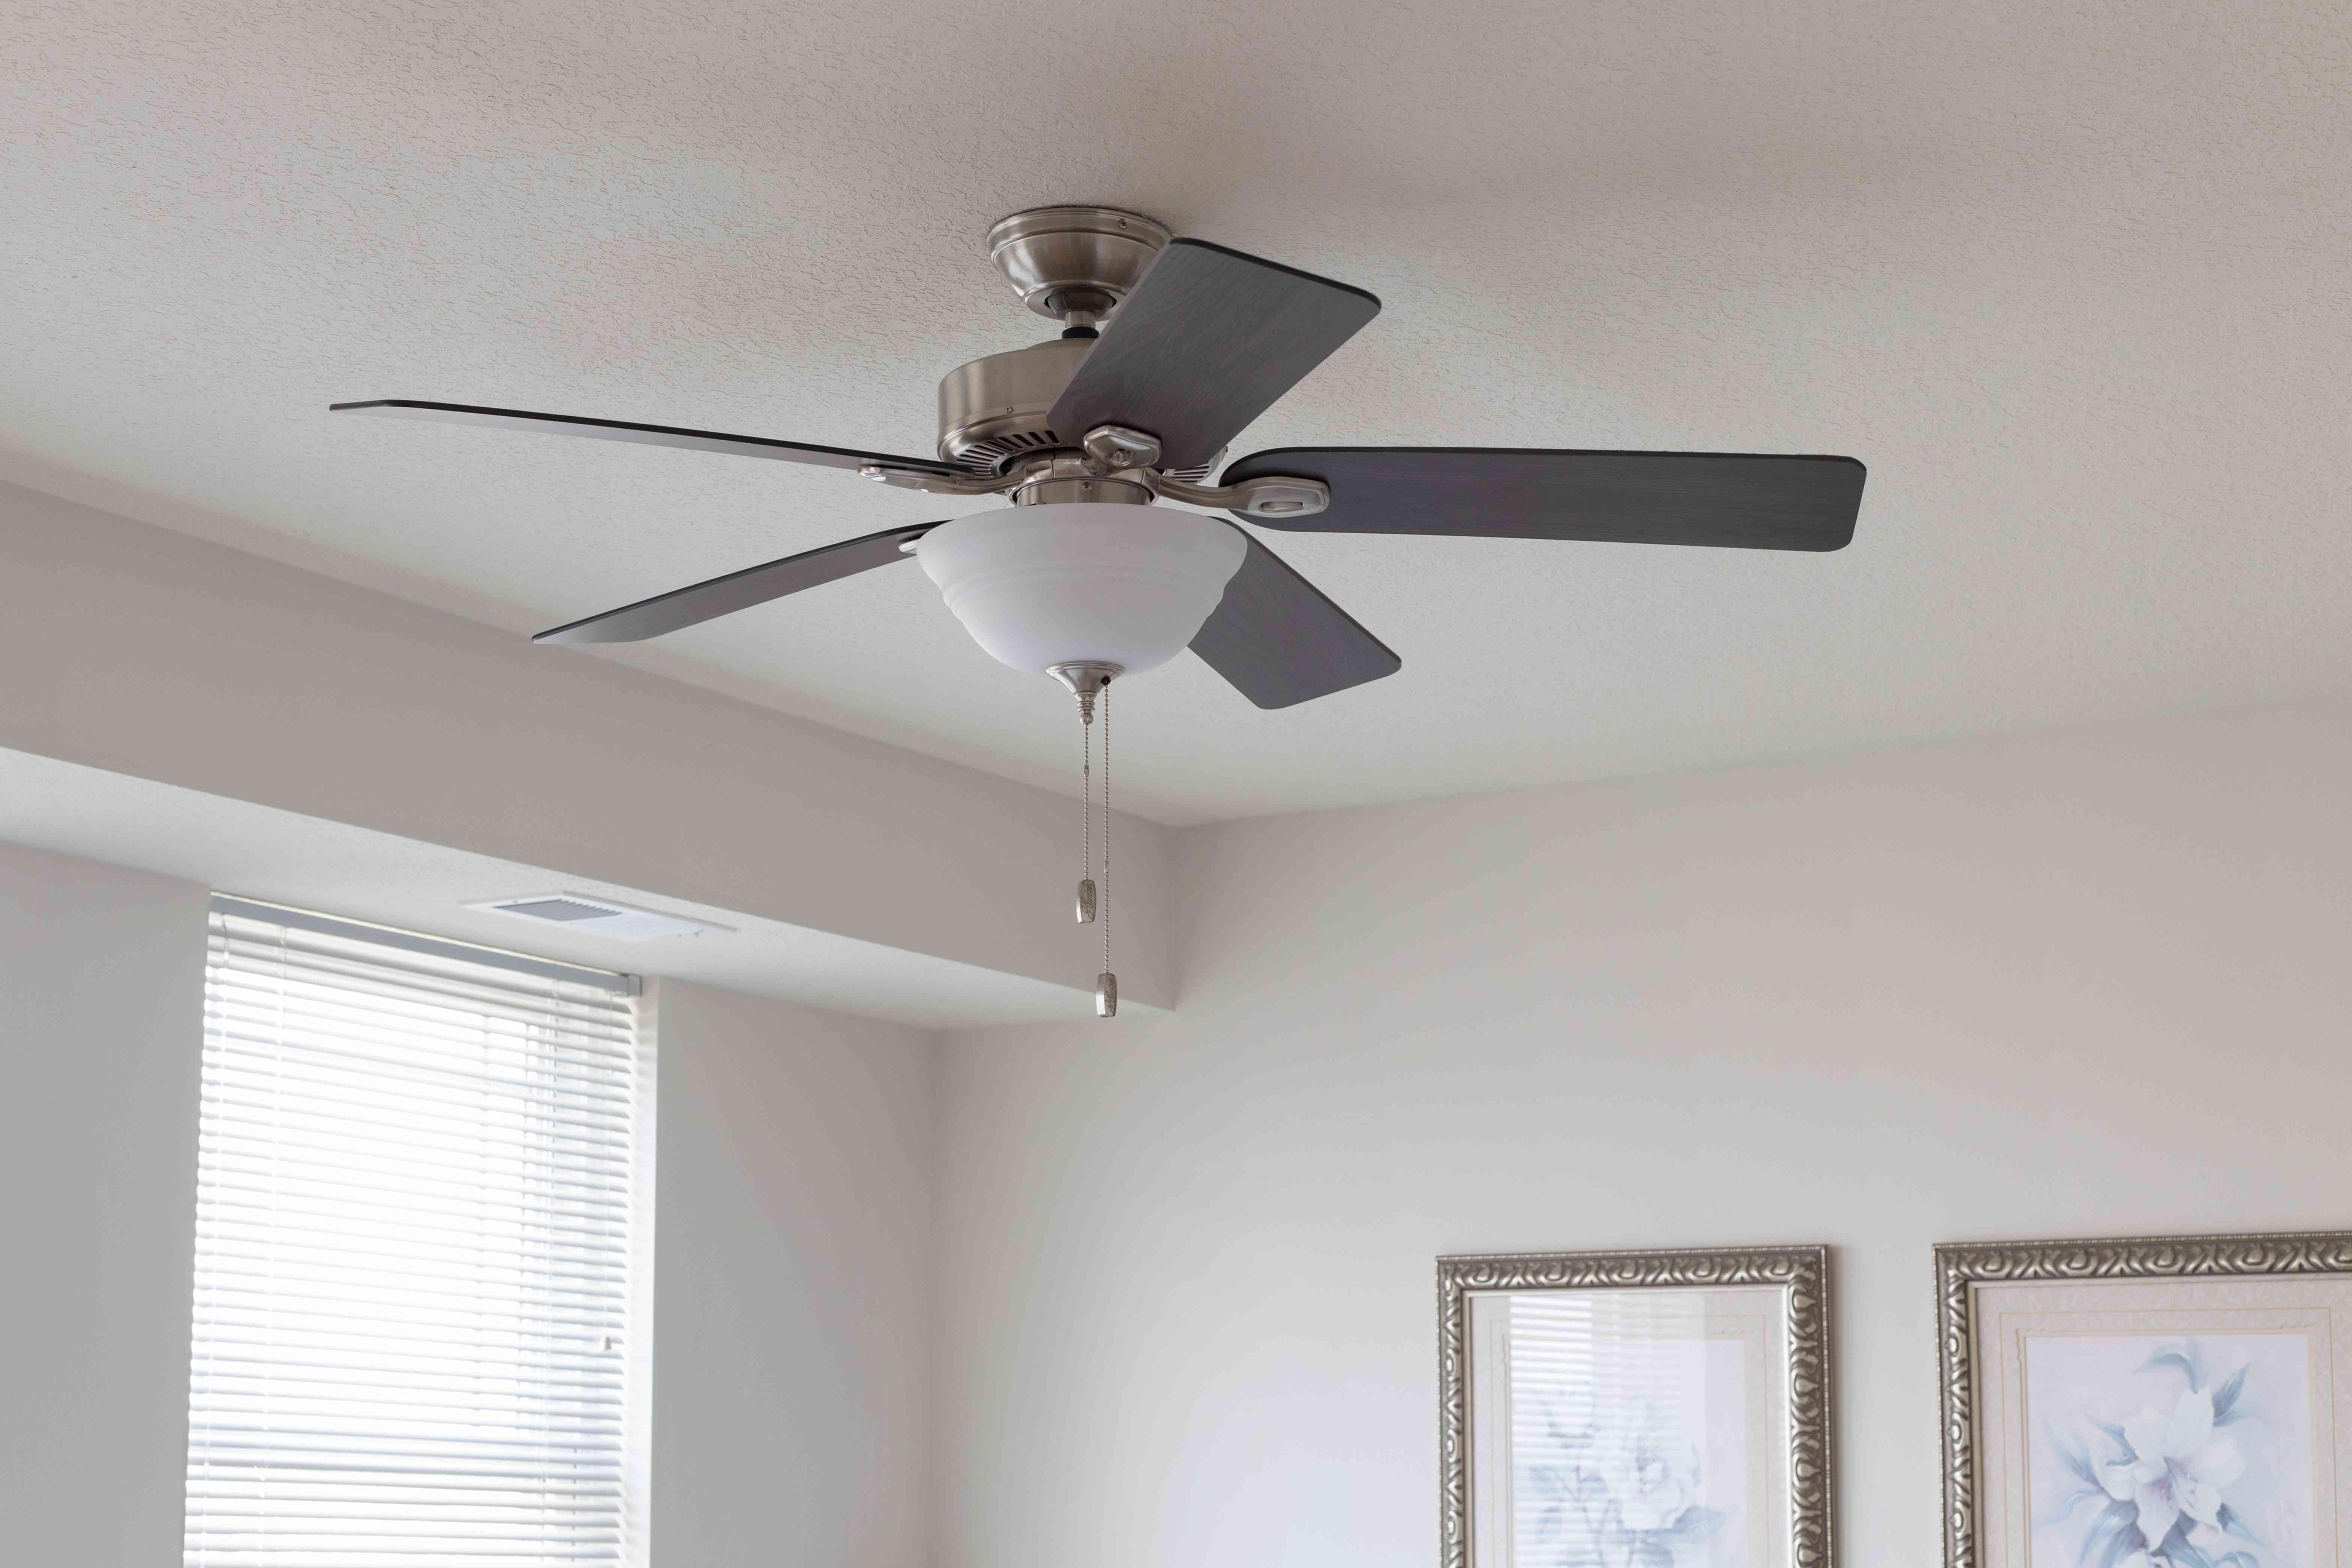 Ceiling fan in house to lower electricity bill